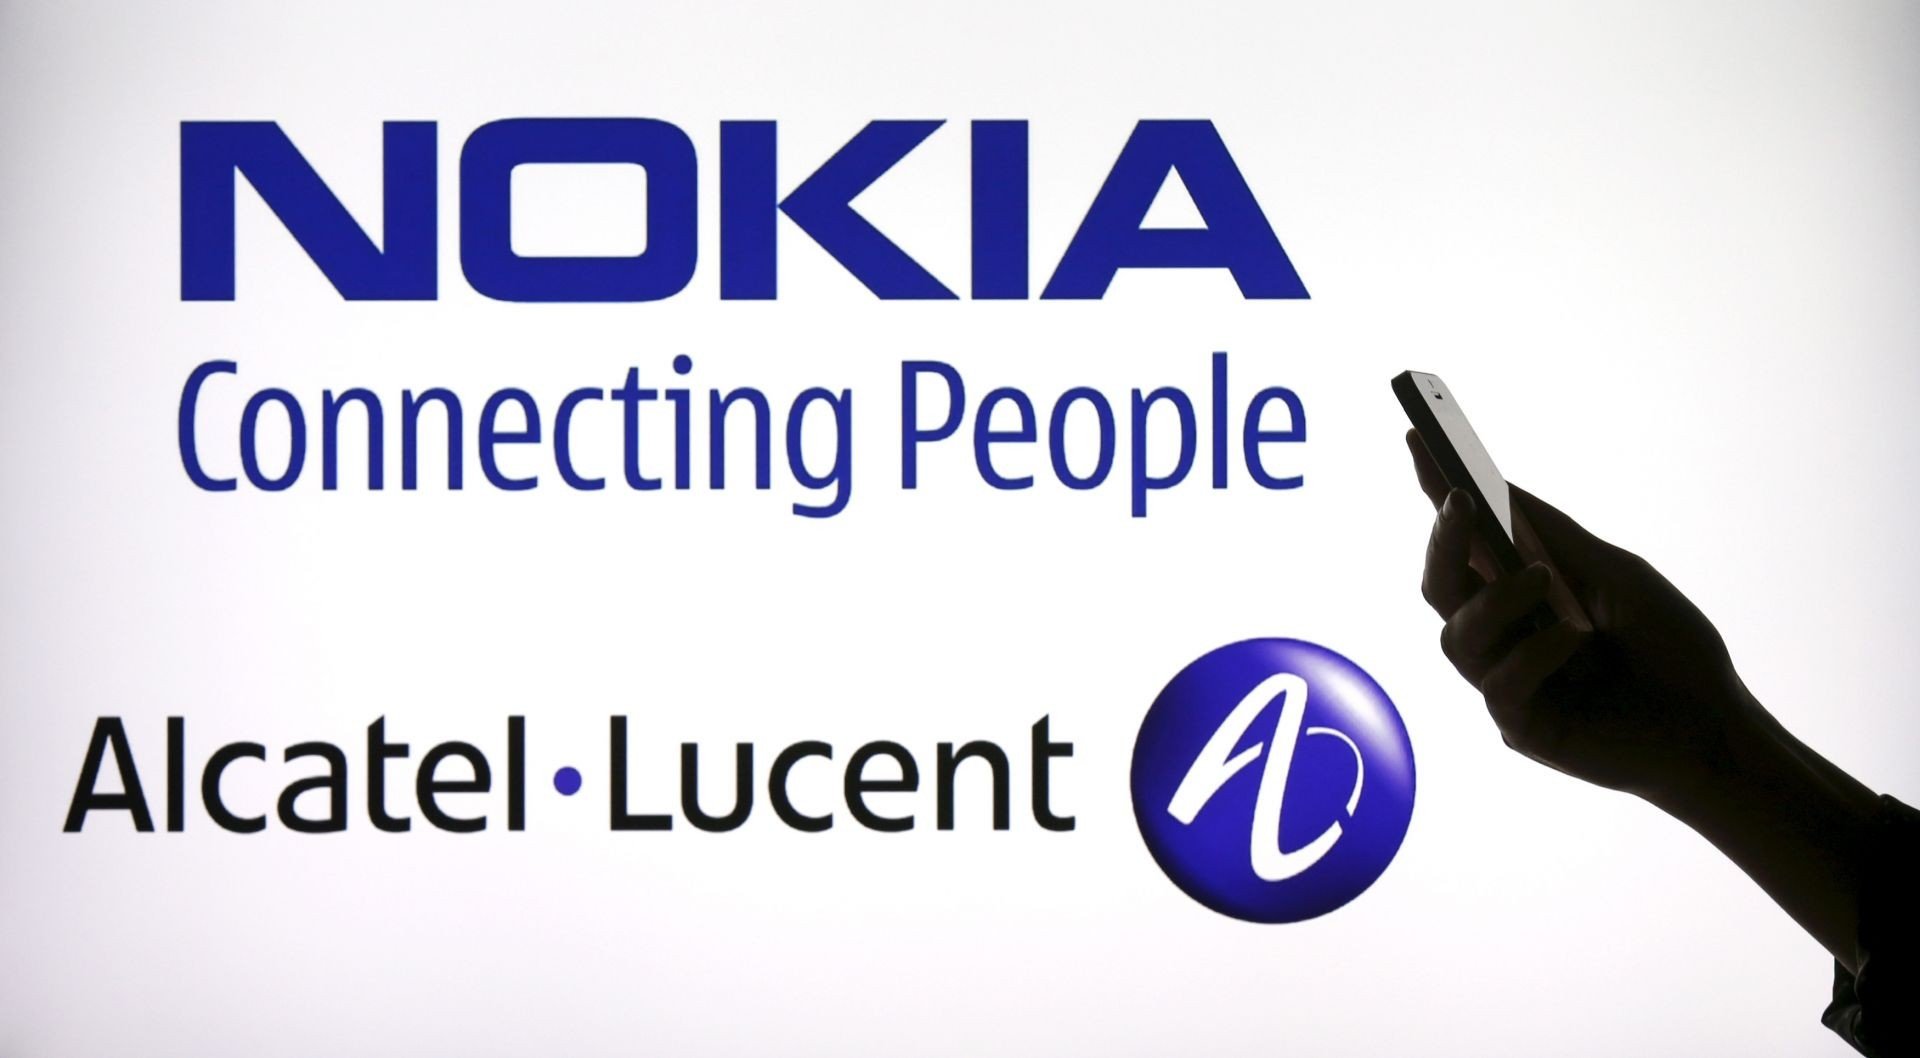 ЕК одобрила слияние компаний Nokia и Alcatel-Lucent